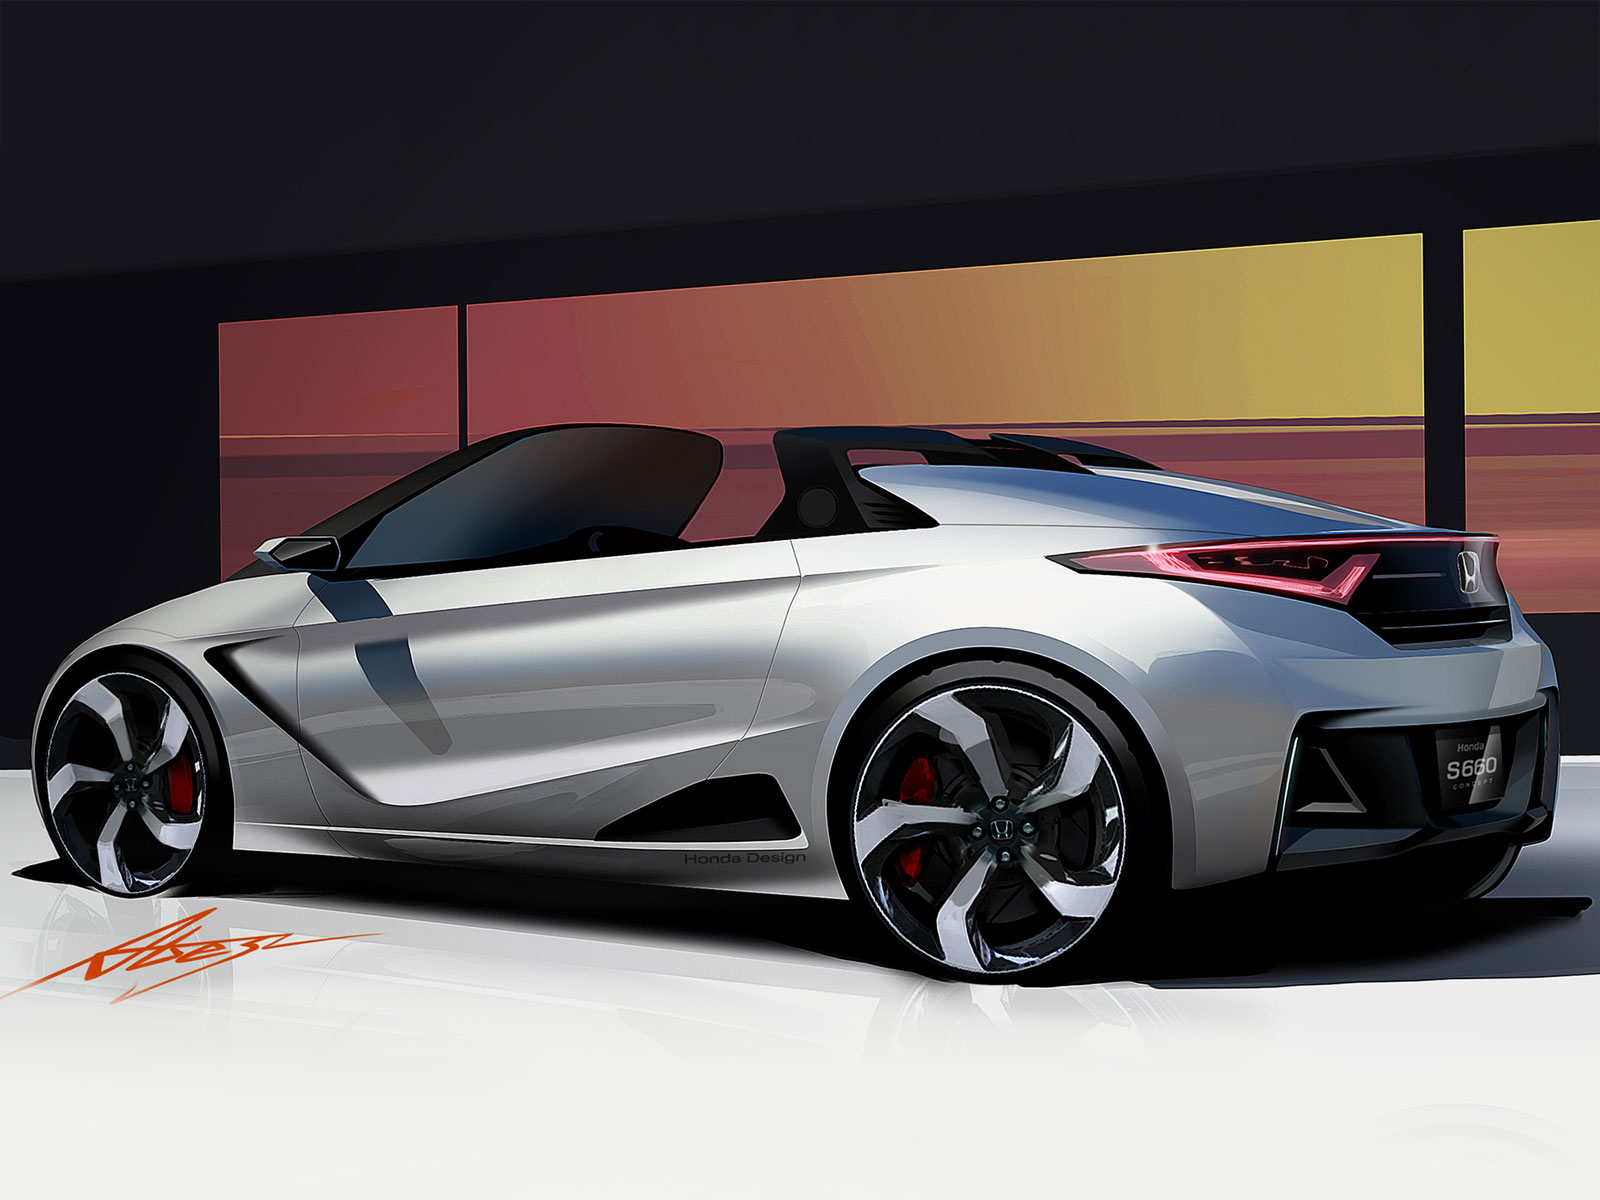 Honda S660 Concept - Design Sketch - Car Body Design